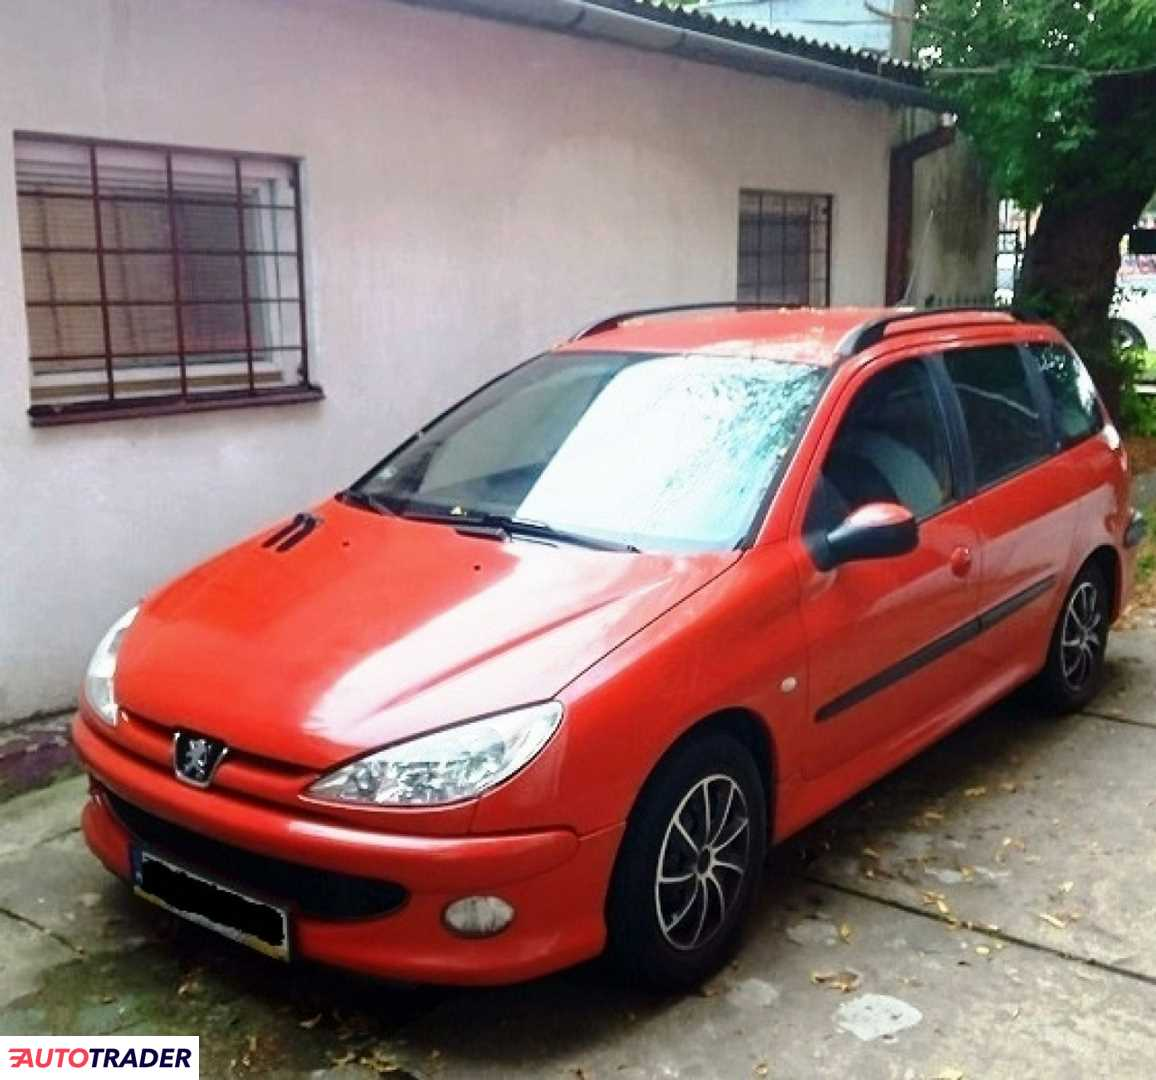 Peugeot 206 2003 1.1 60 KM